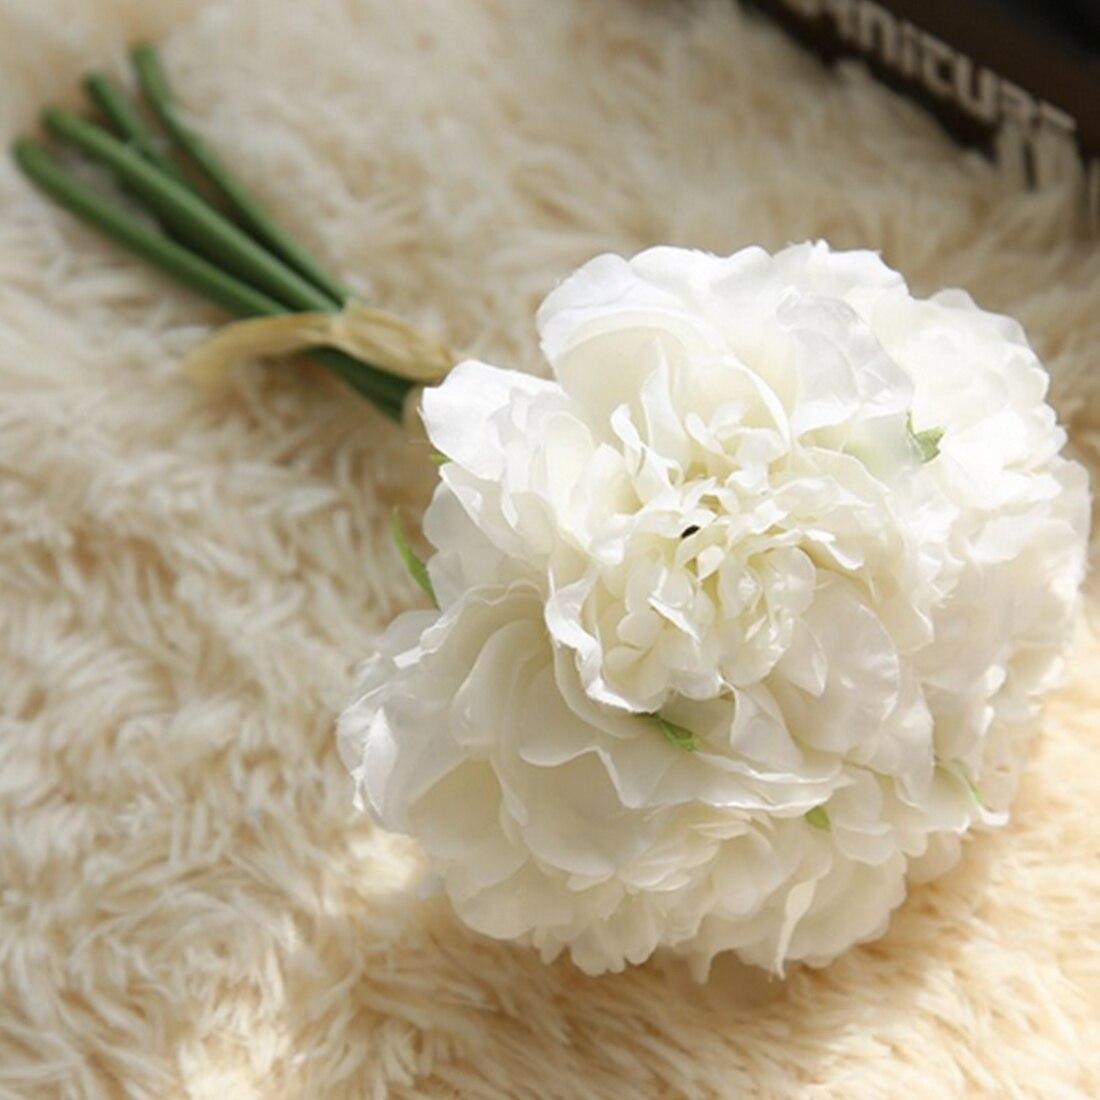 Surwish Plastic Artificial Flowers Peony Bouquet Decorative Flower